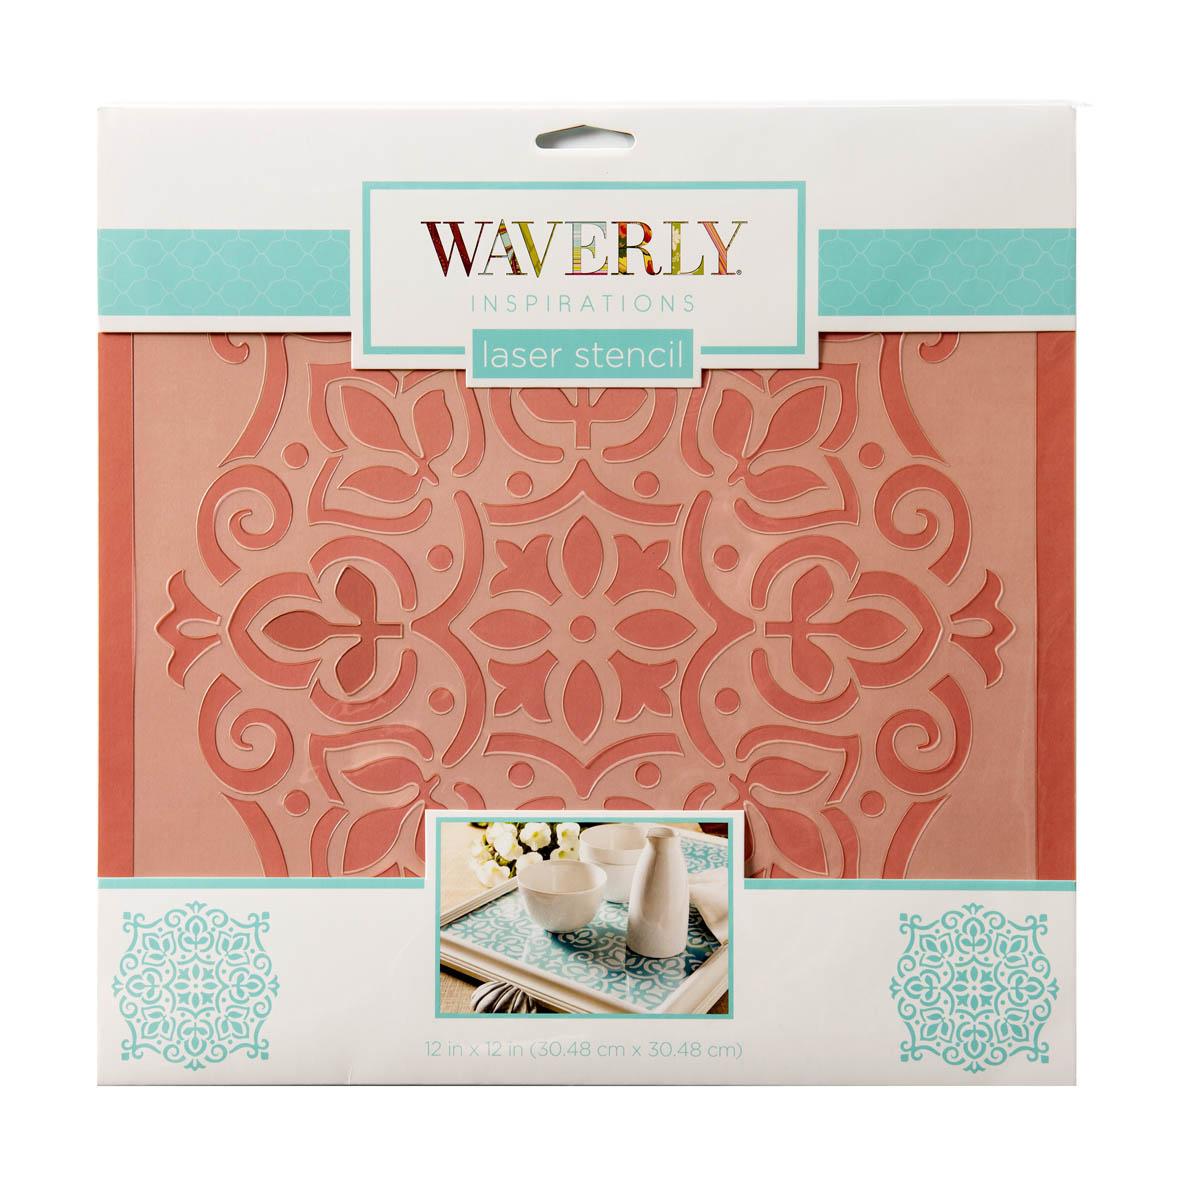 Waverly ® Inspirations Laser Stencils - Décor - Disc, 12